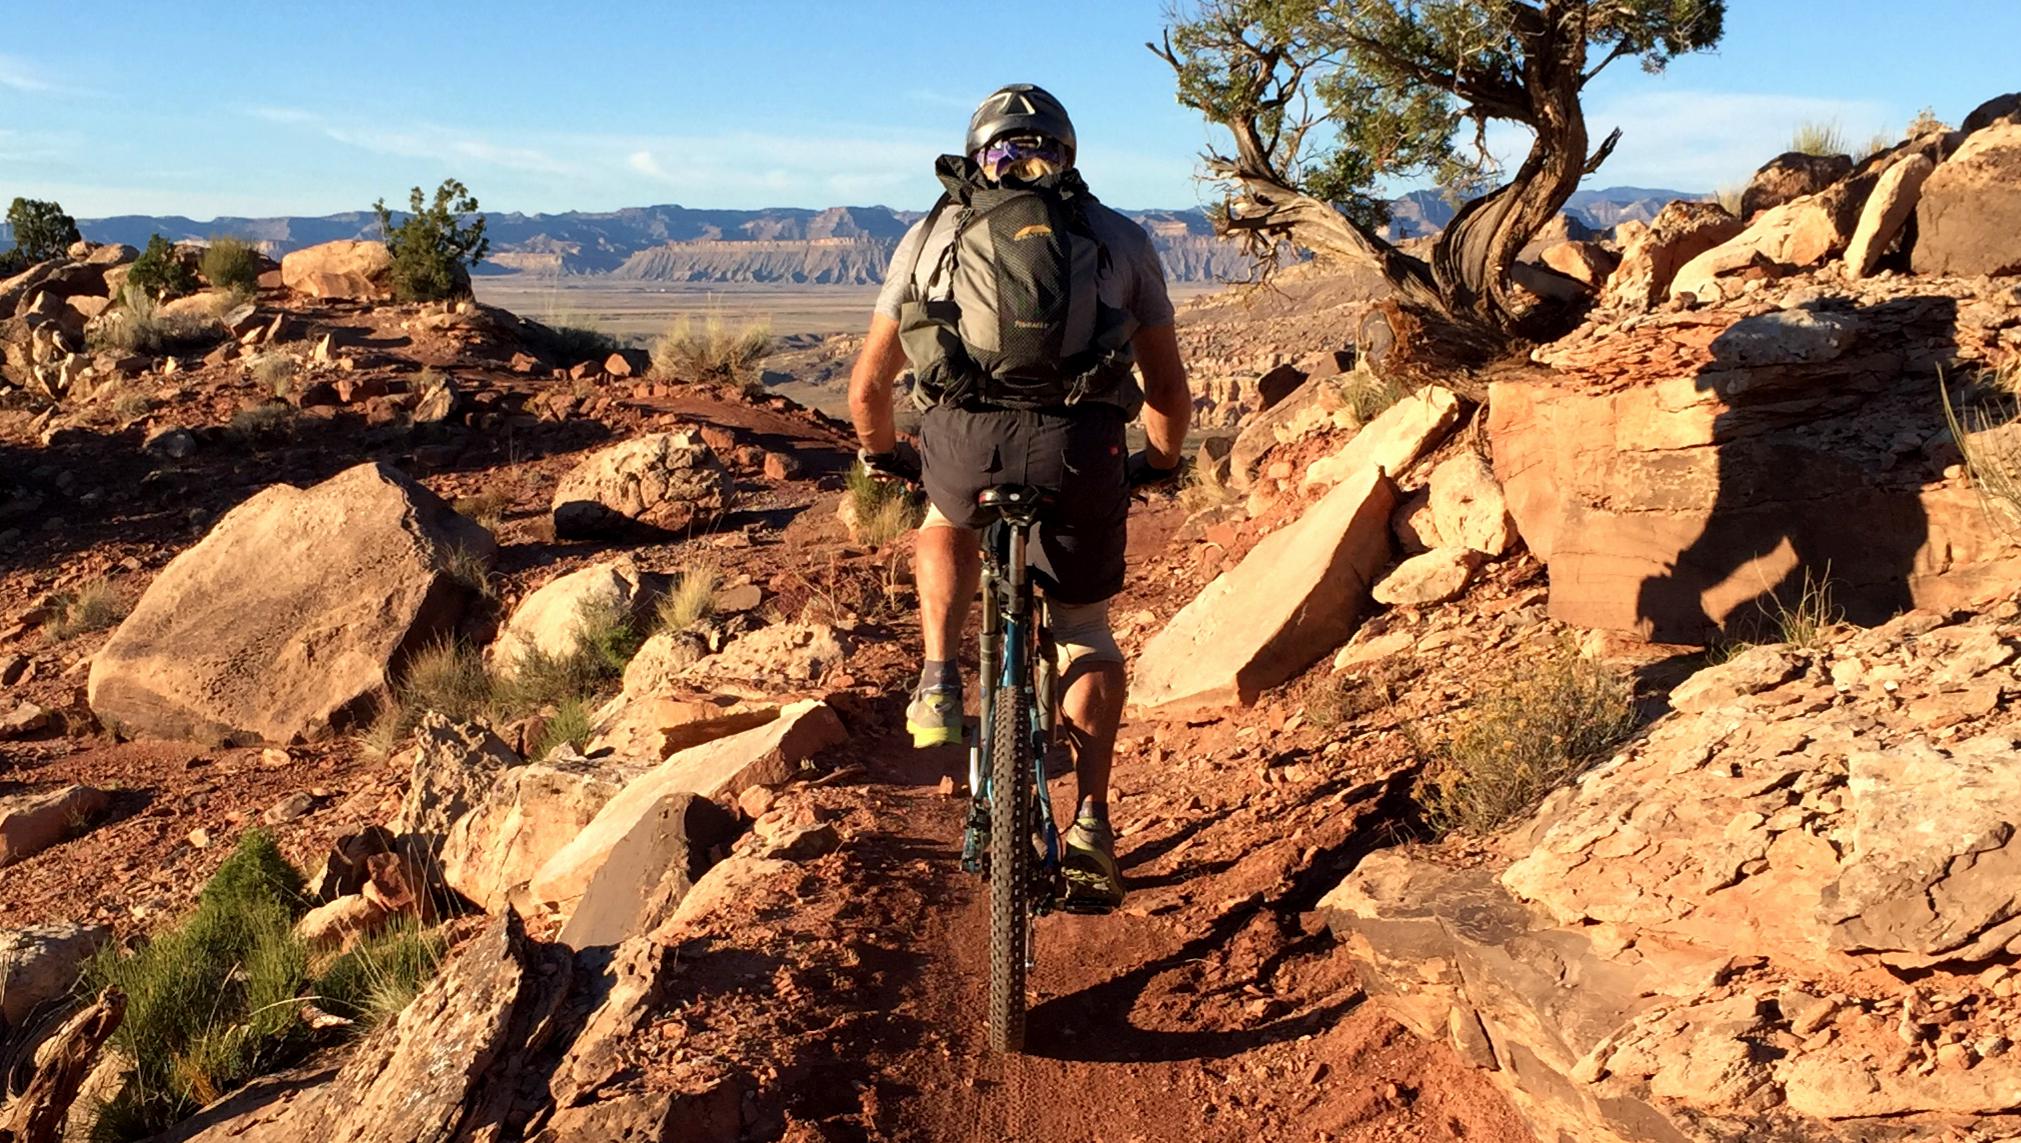 A mountain bike in the desert